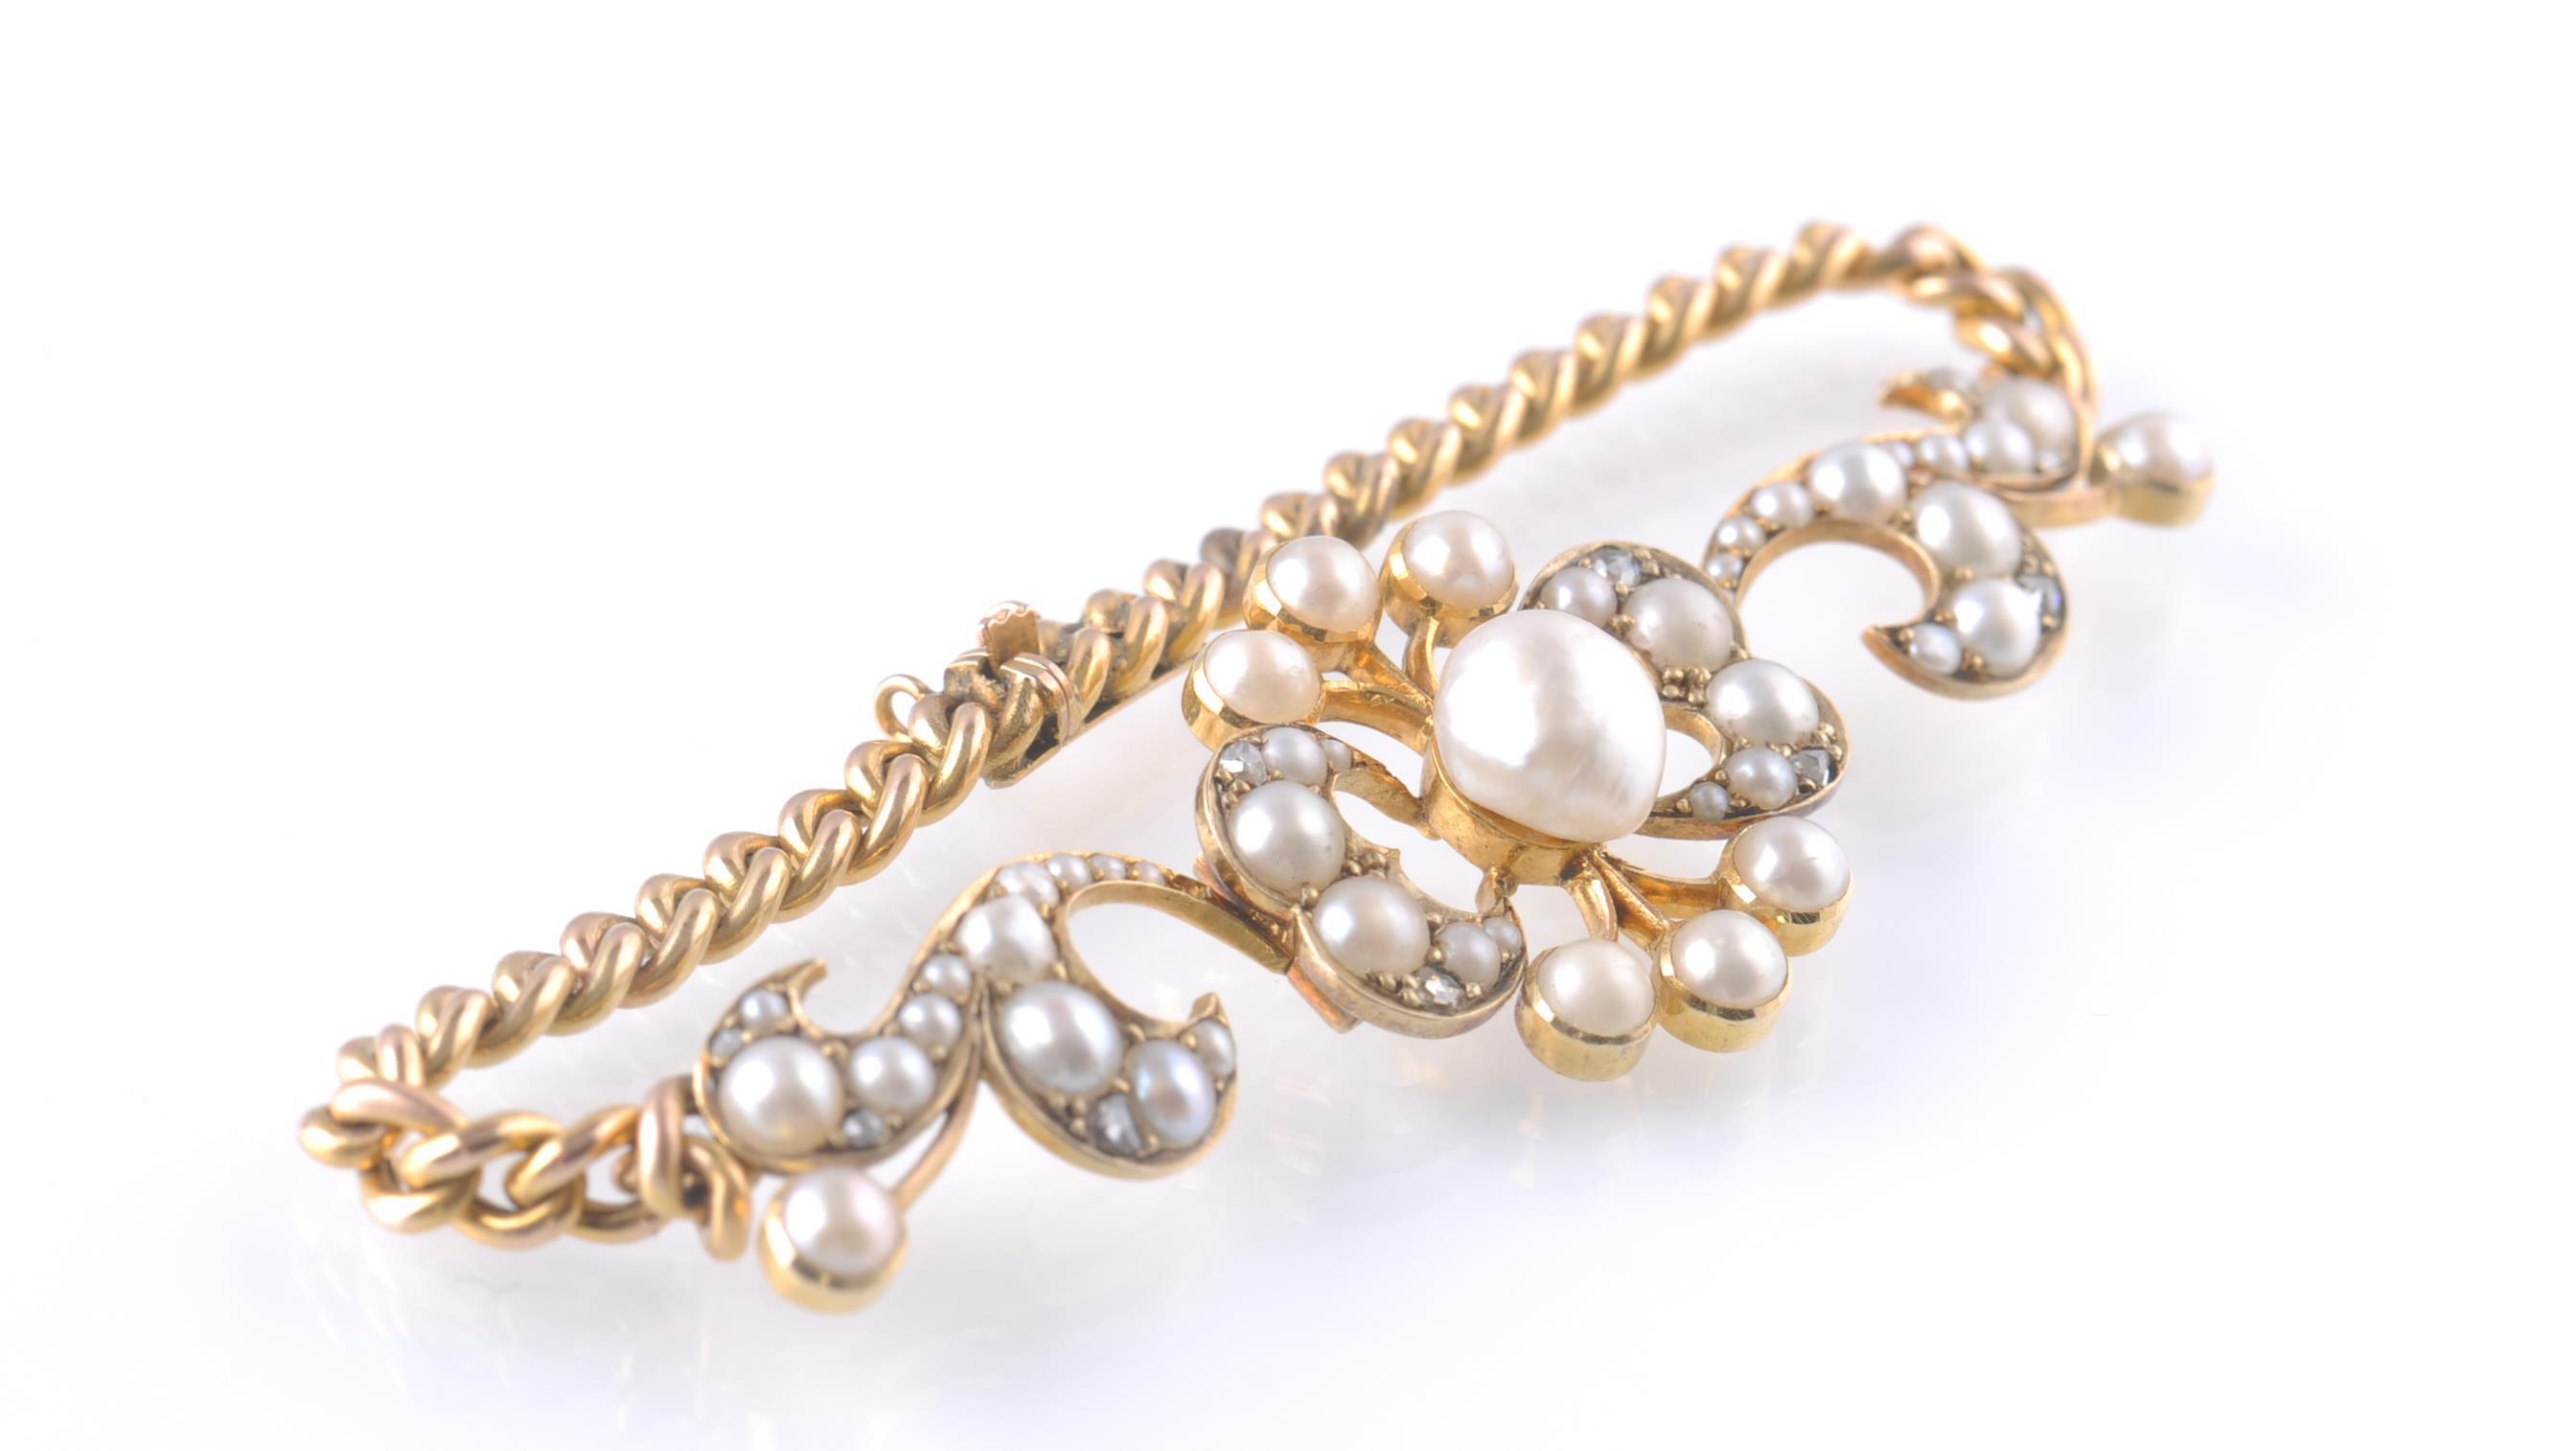 Lot 67 - A 15CT GOLD PEARL & DIAMOND BRACELET